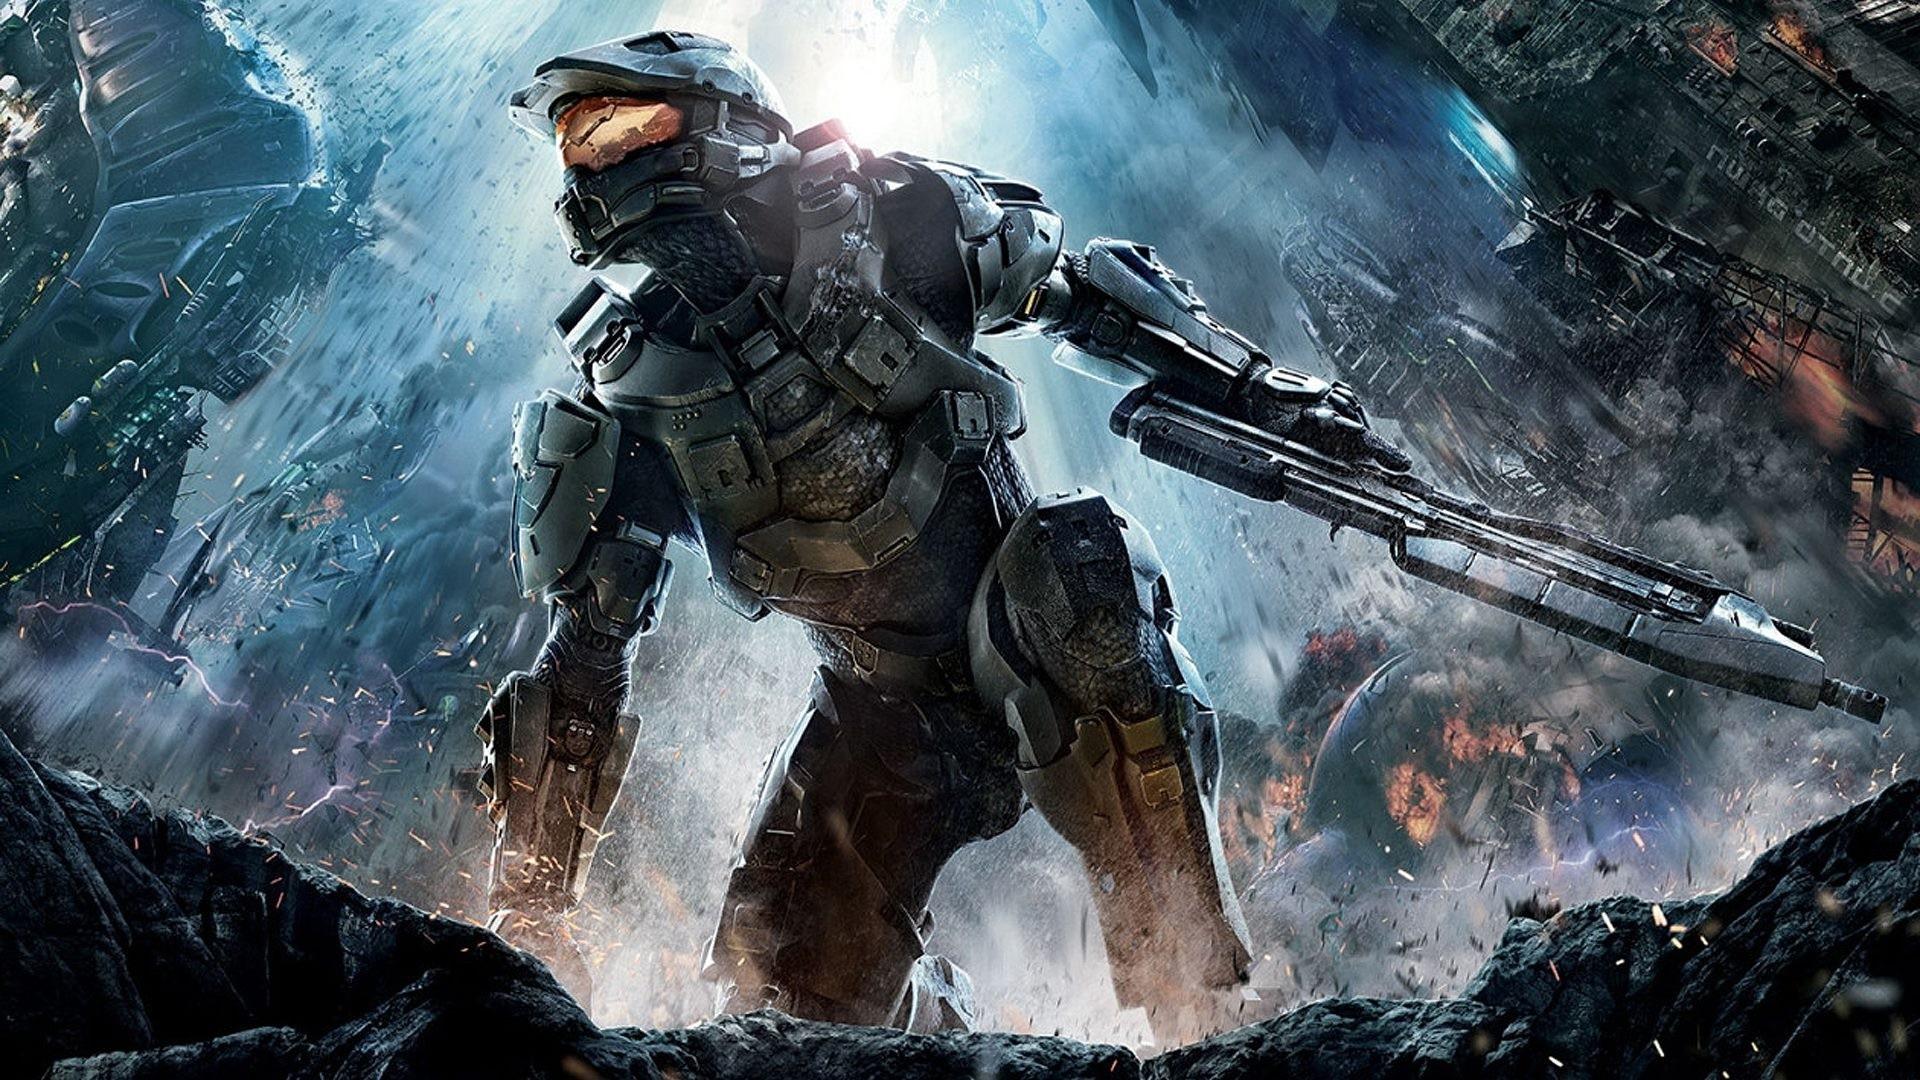 Halo Wallpaper HD by ockre on DeviantArt Halo 4 Wallpapers HD Wallpapers)